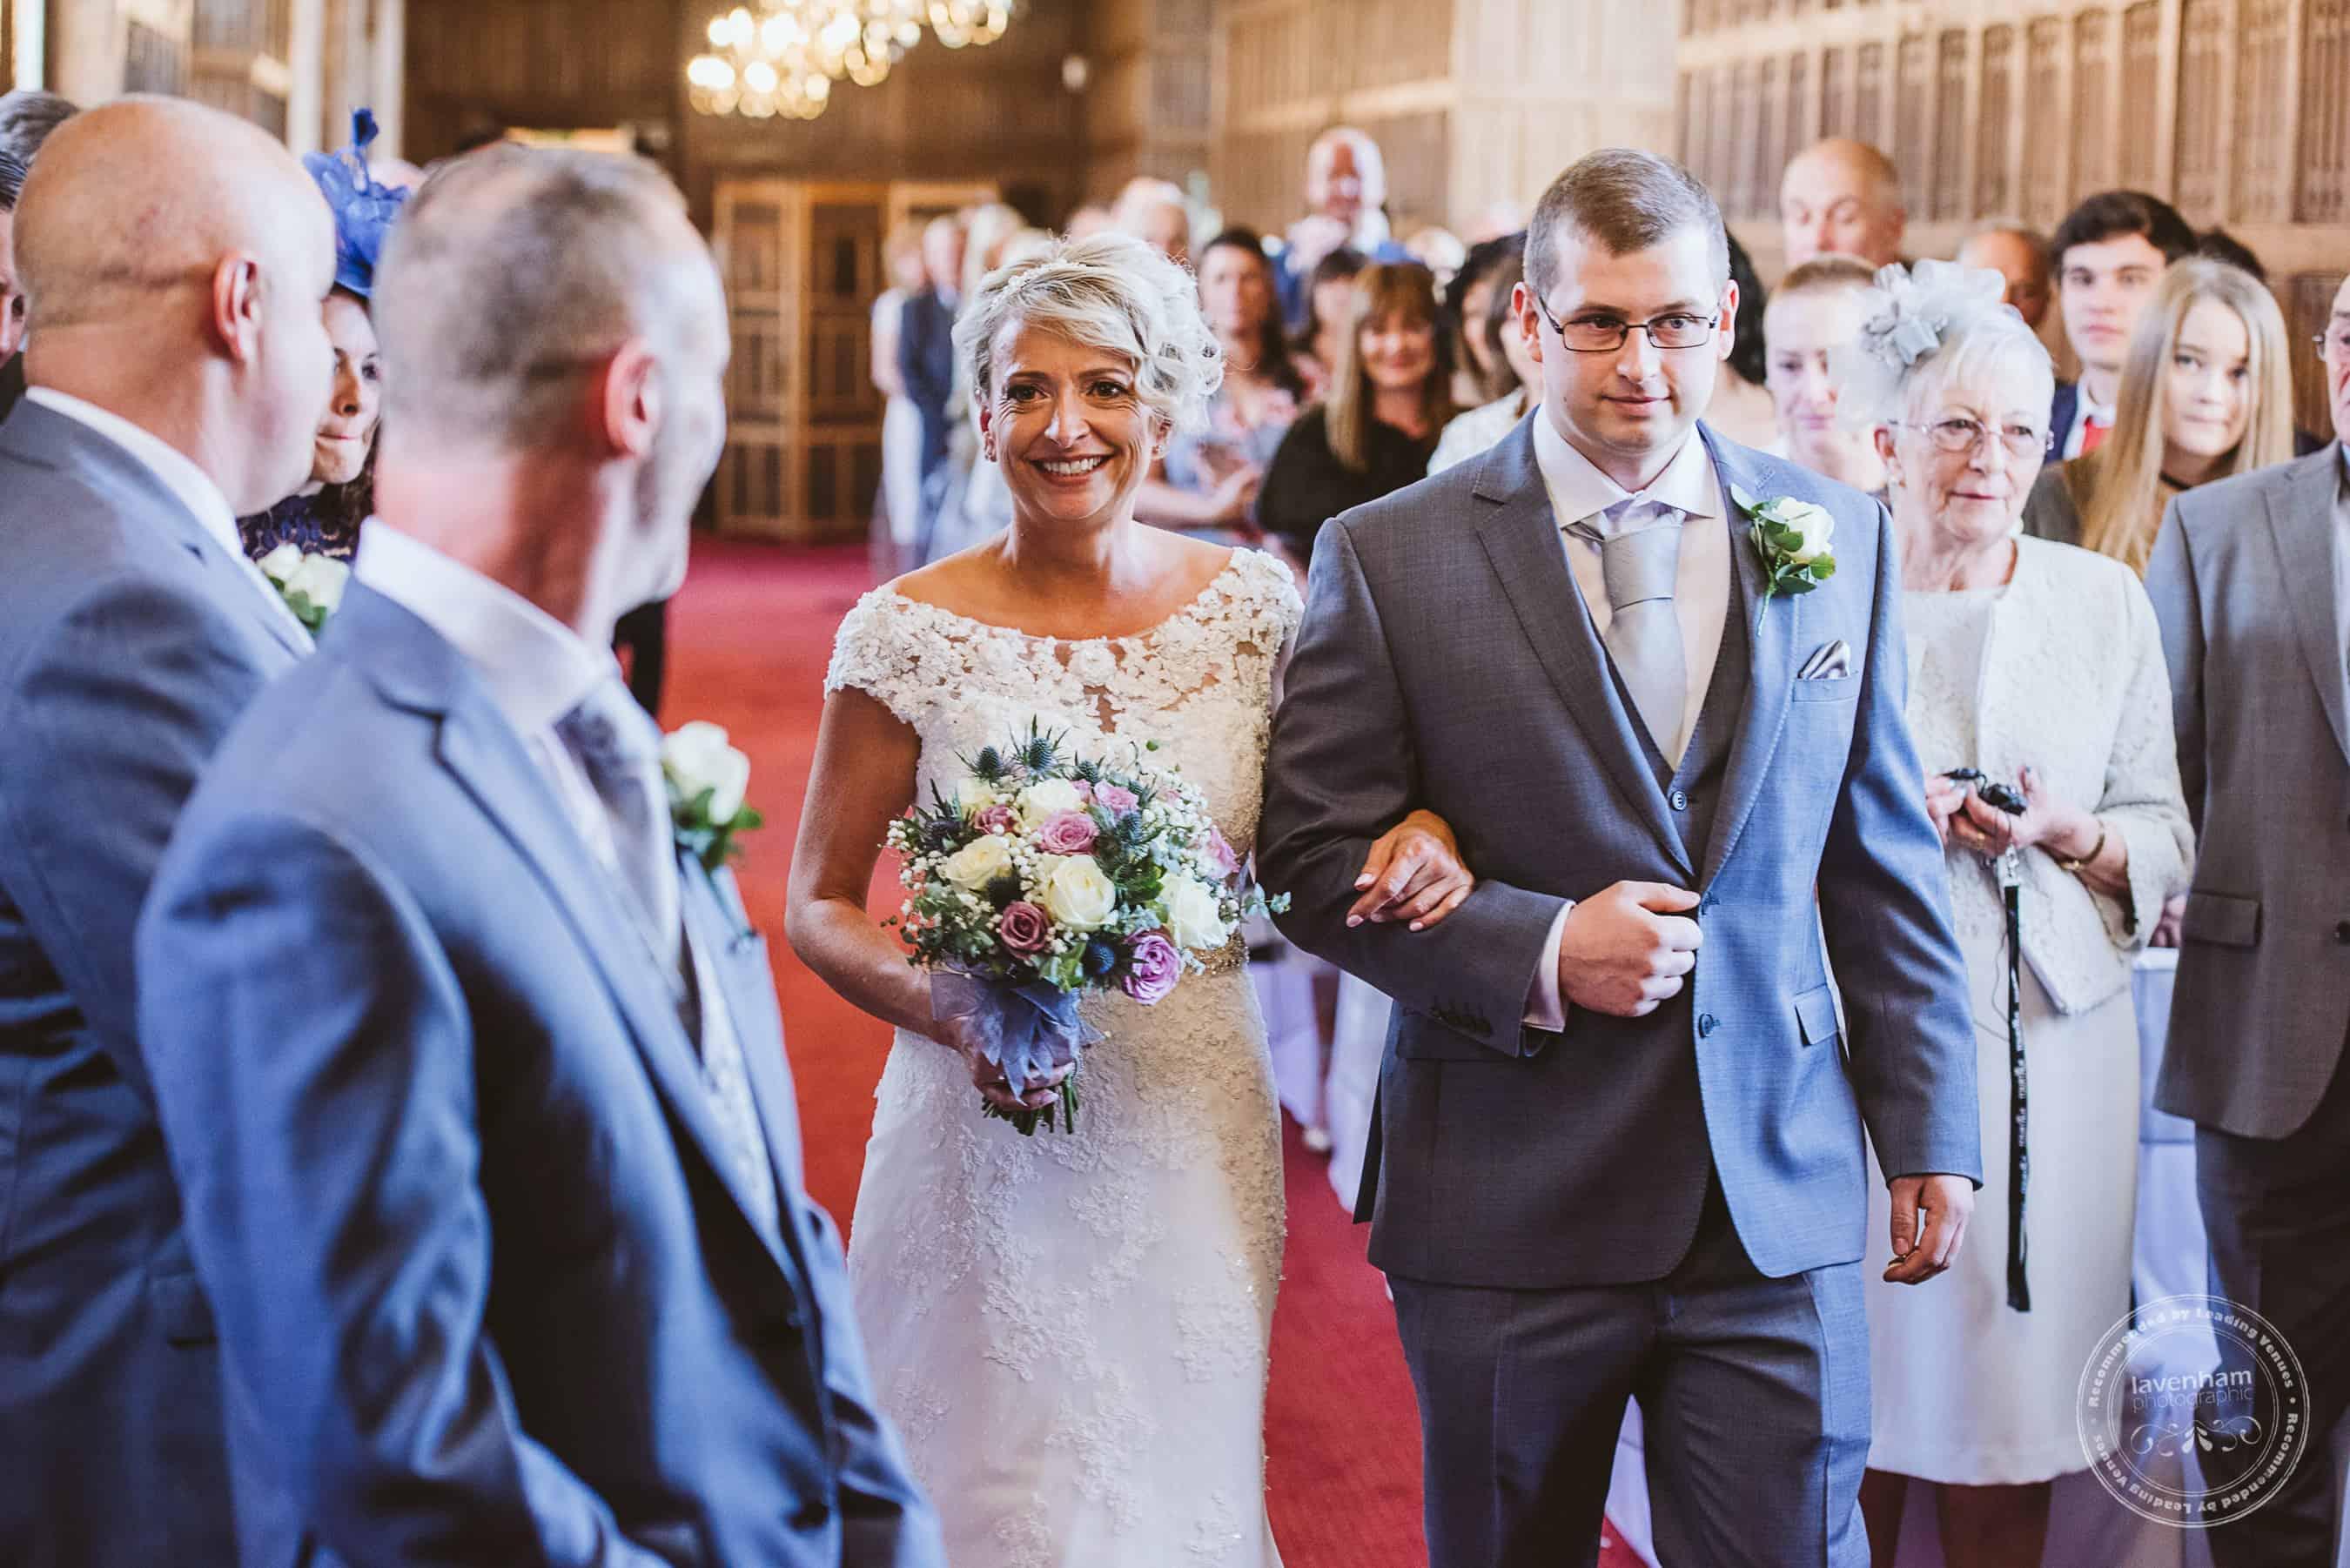 281018 Gosfield Hall Wedding Photography Lavenham Photographic 048